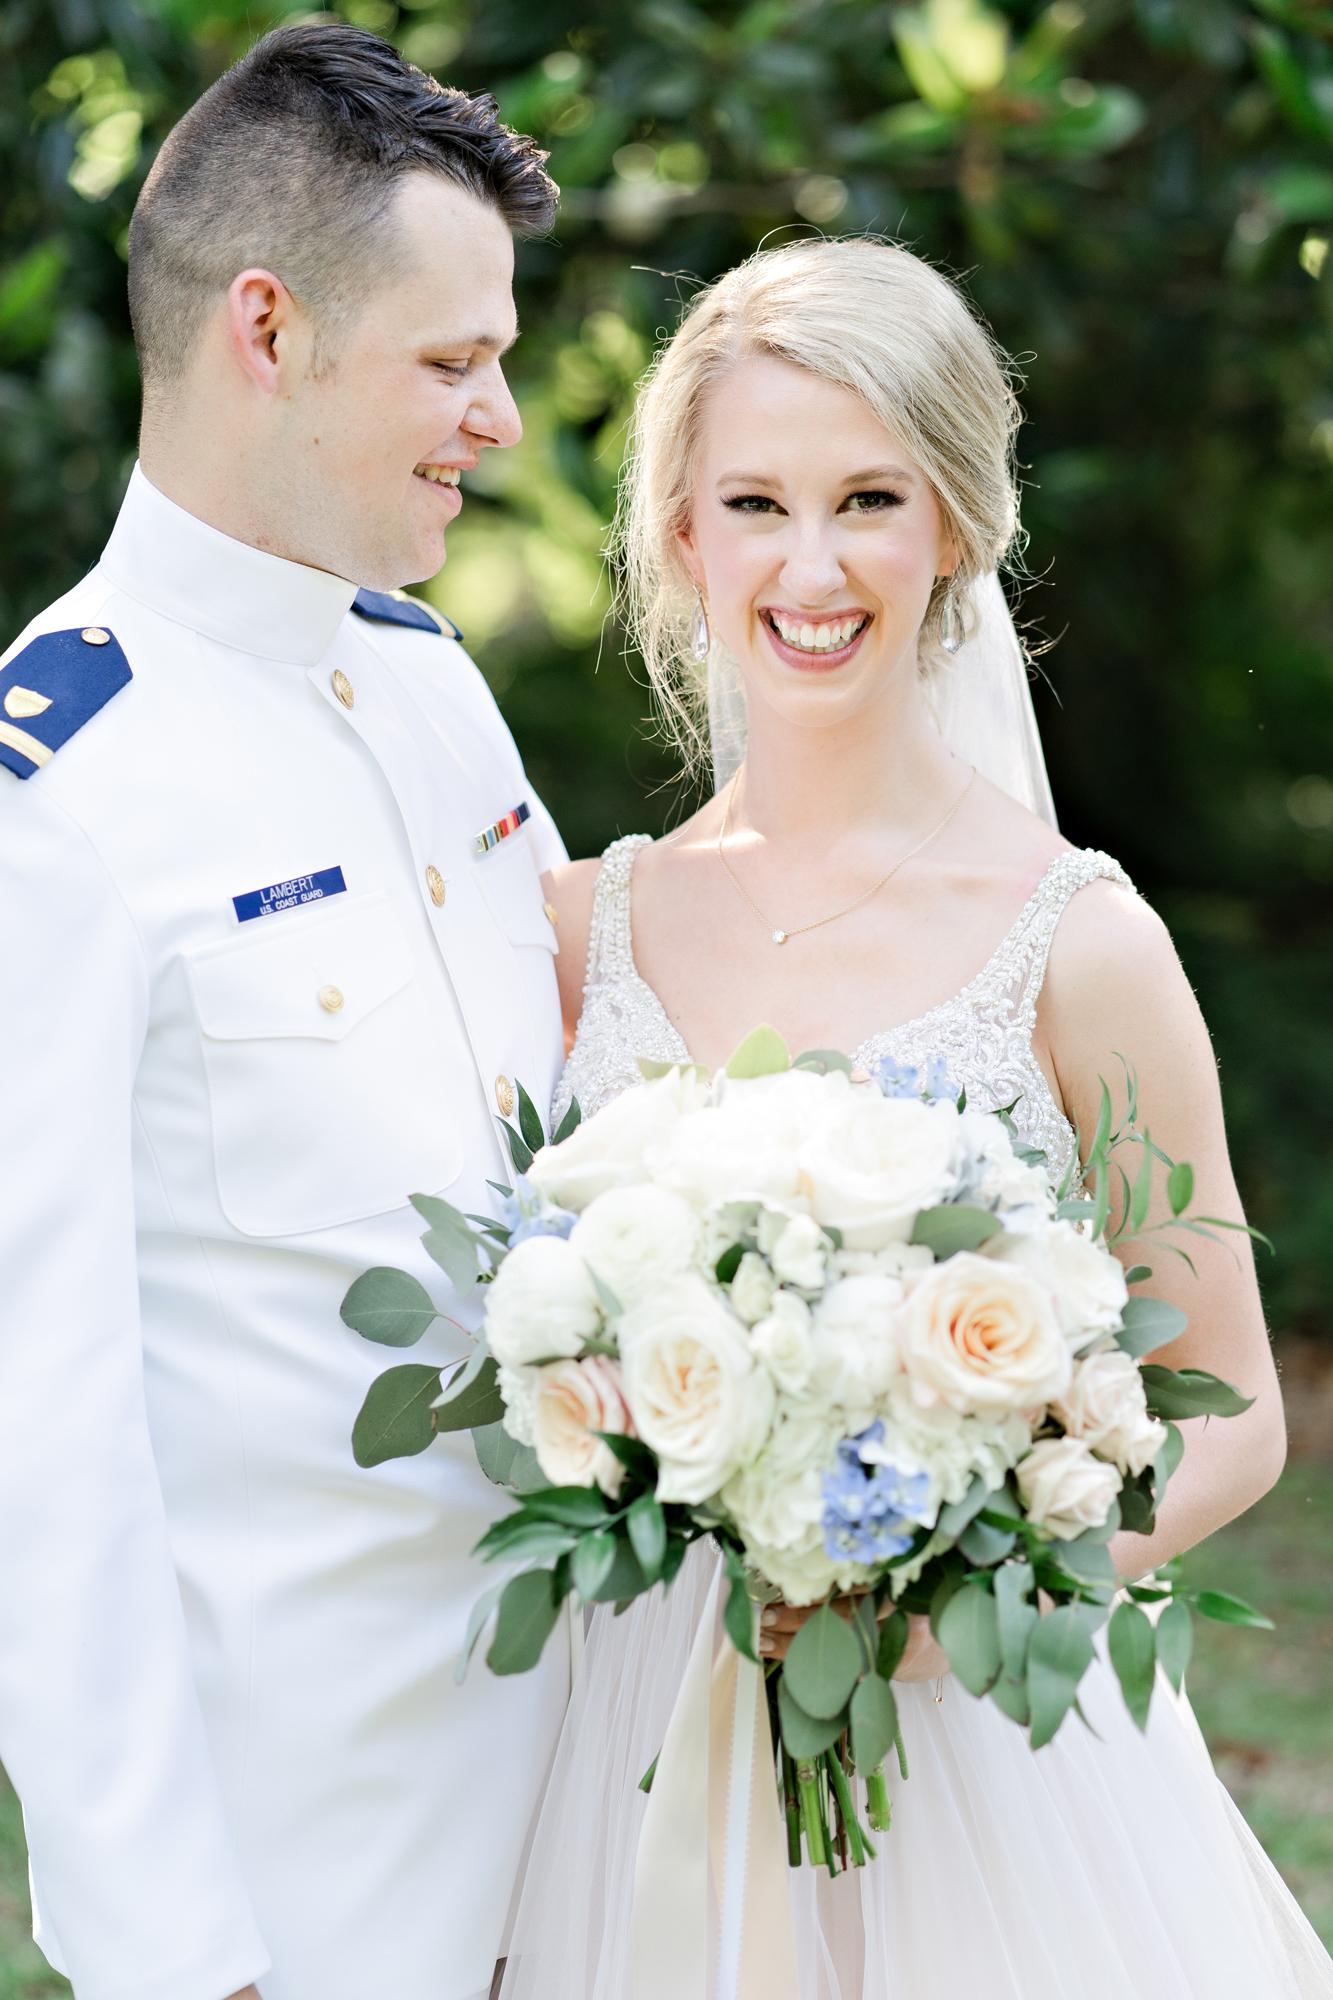 Alabama-Photographers-Nick-Drollette-Wedding-Photography-128.jpg